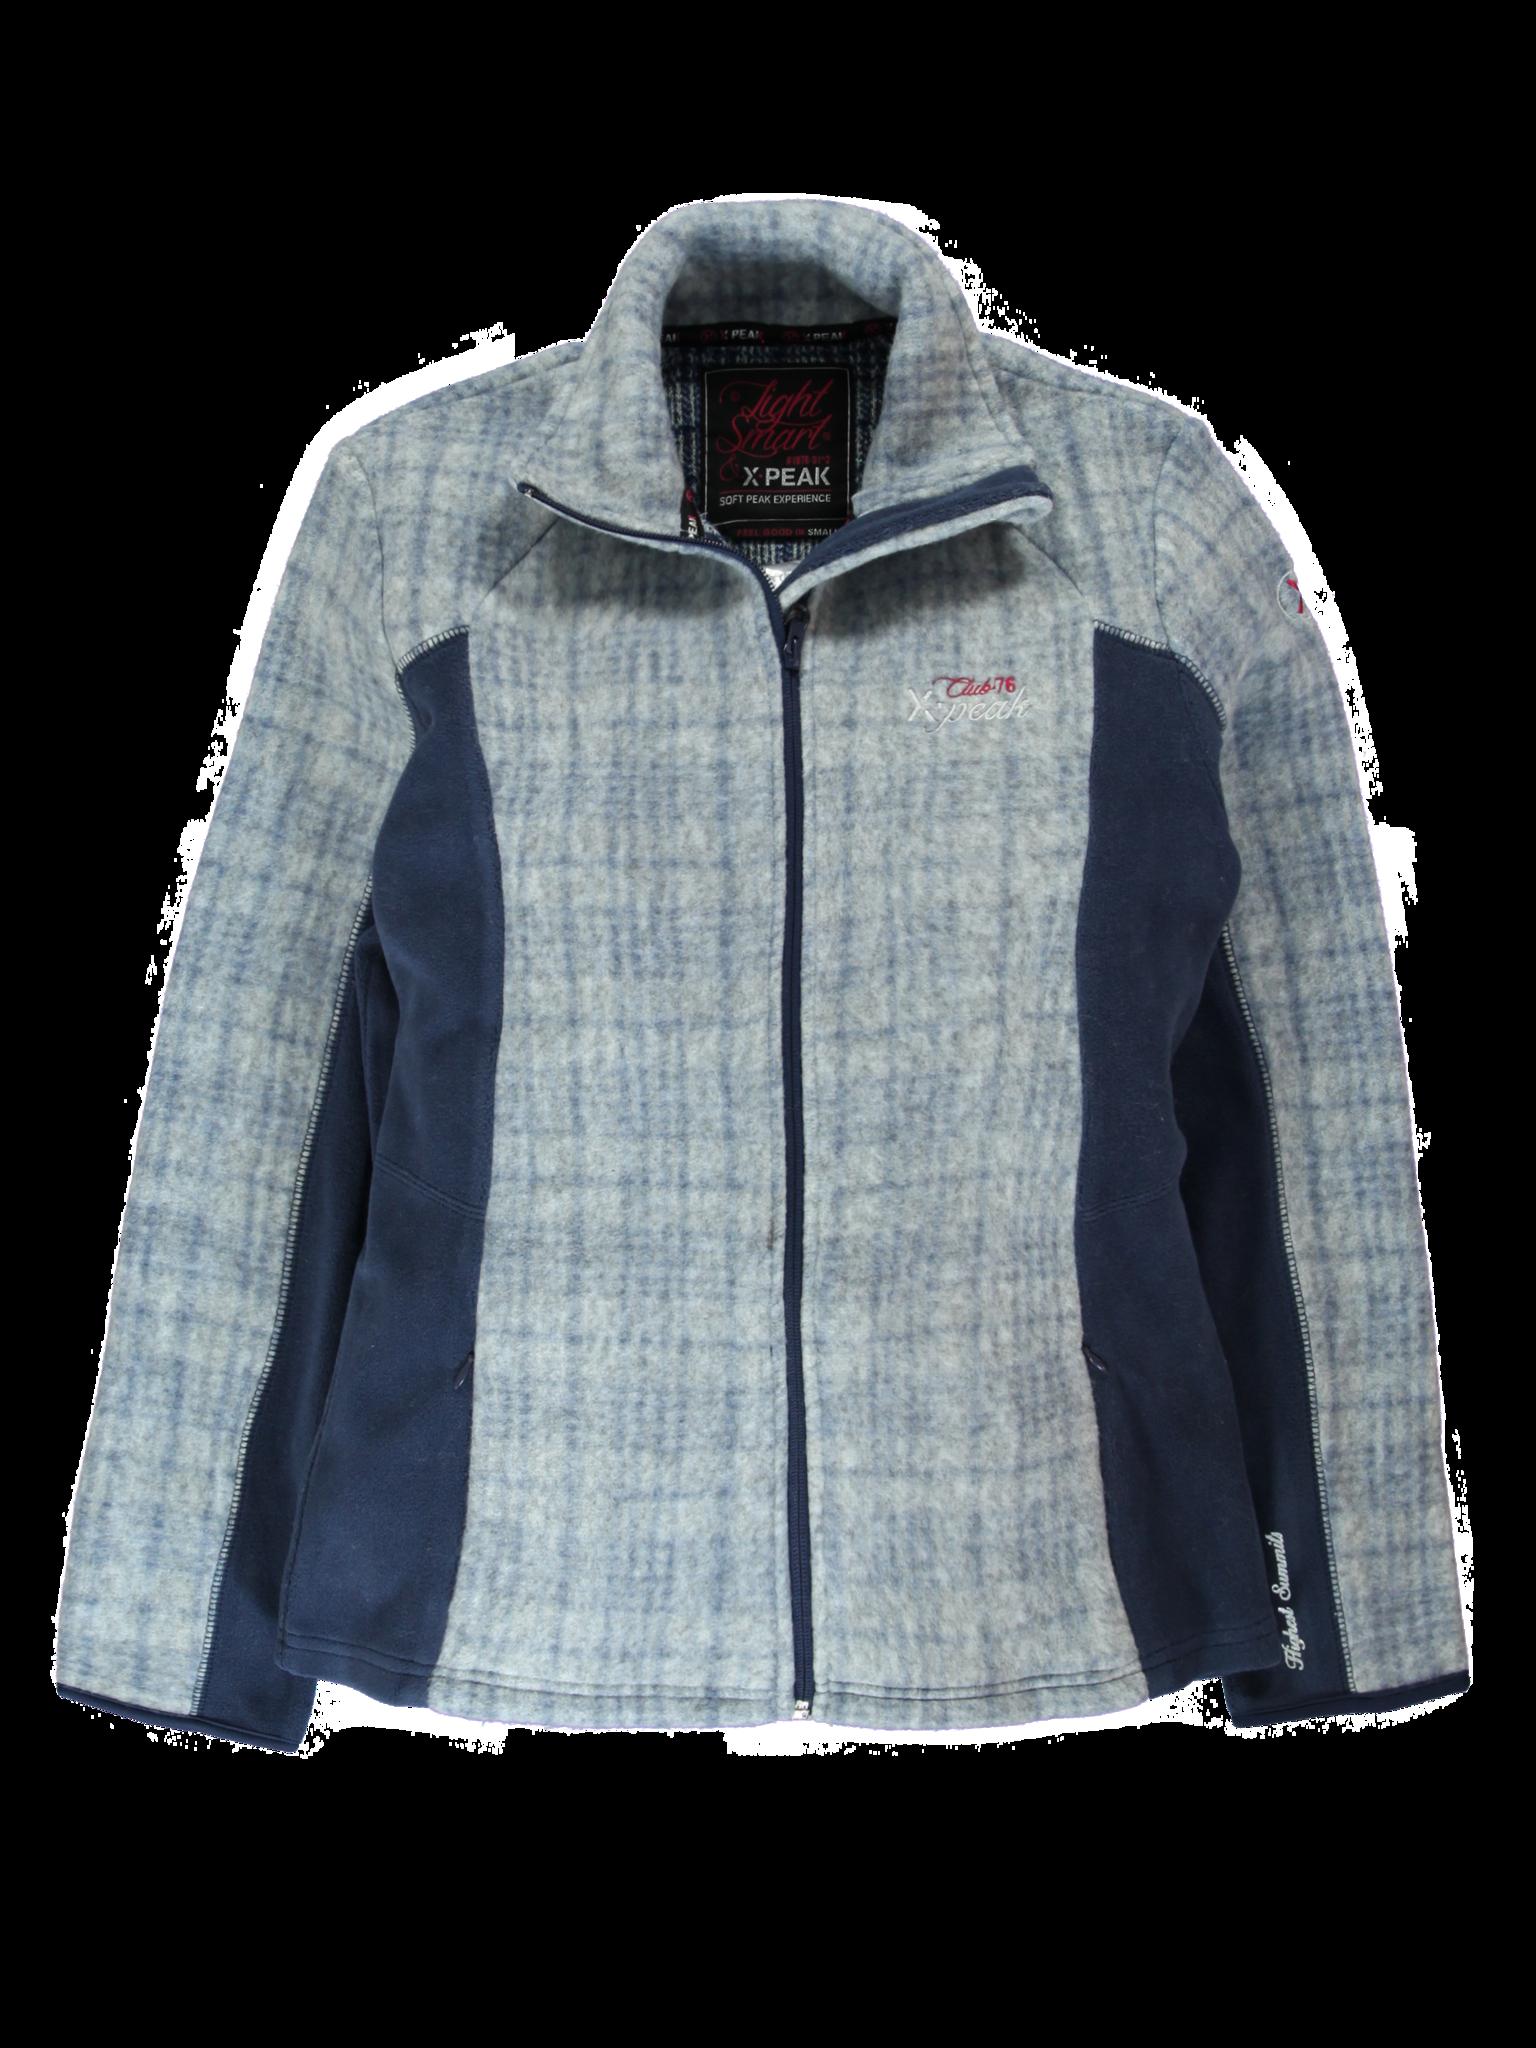 All Brands   Winterproducts Ladies   Cardigan Sweater   16 pcs/box